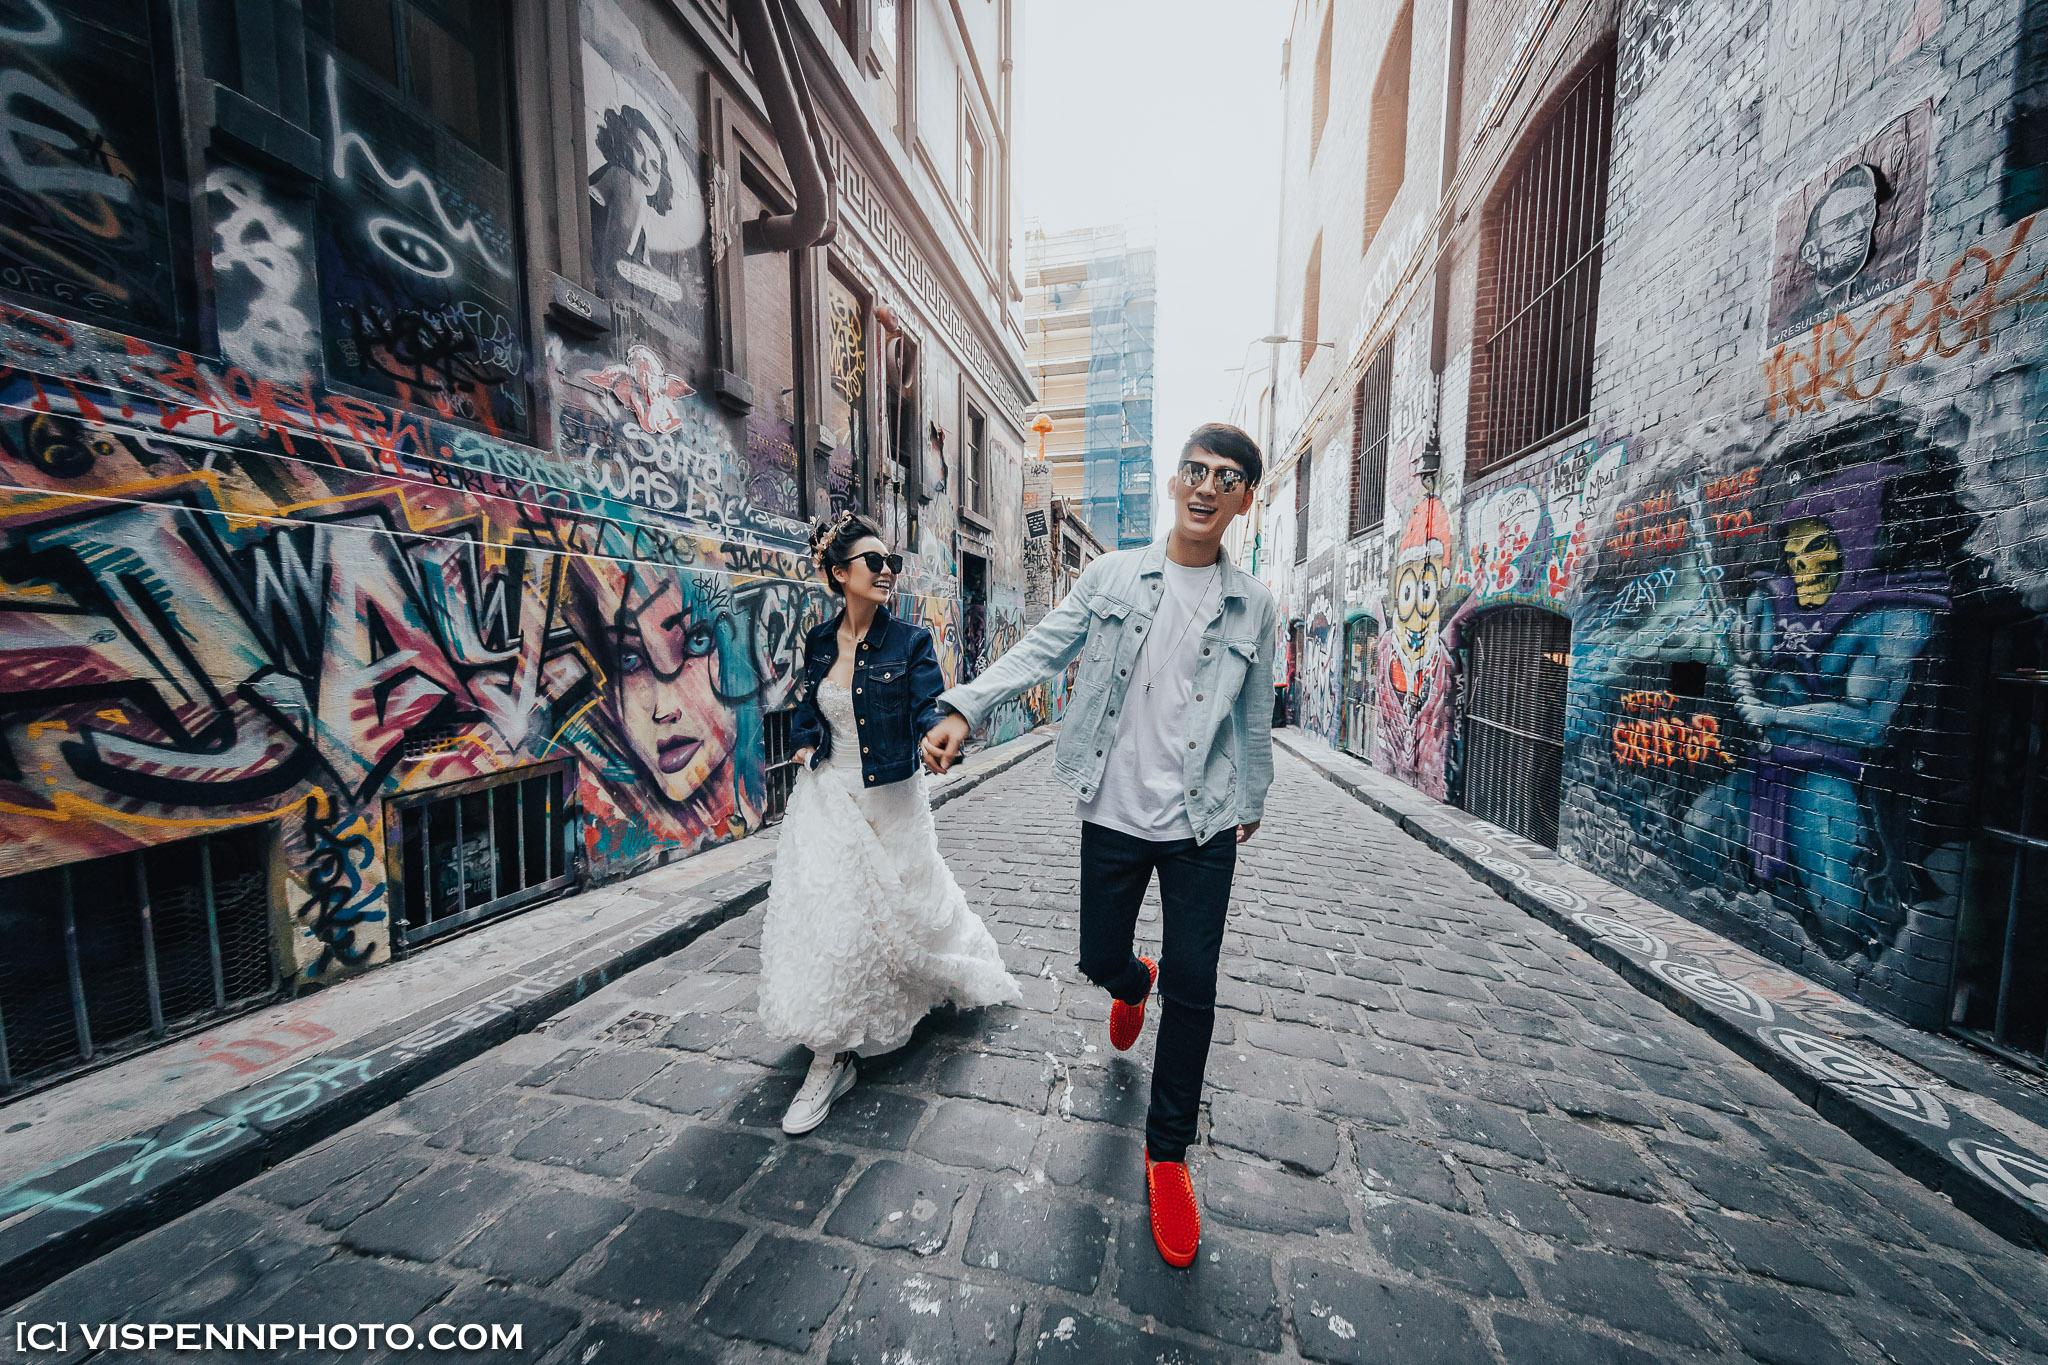 PRE WEDDING Photography Melbourne VISPENN 墨尔本 婚纱照 结婚照 婚纱摄影 5D4 2793